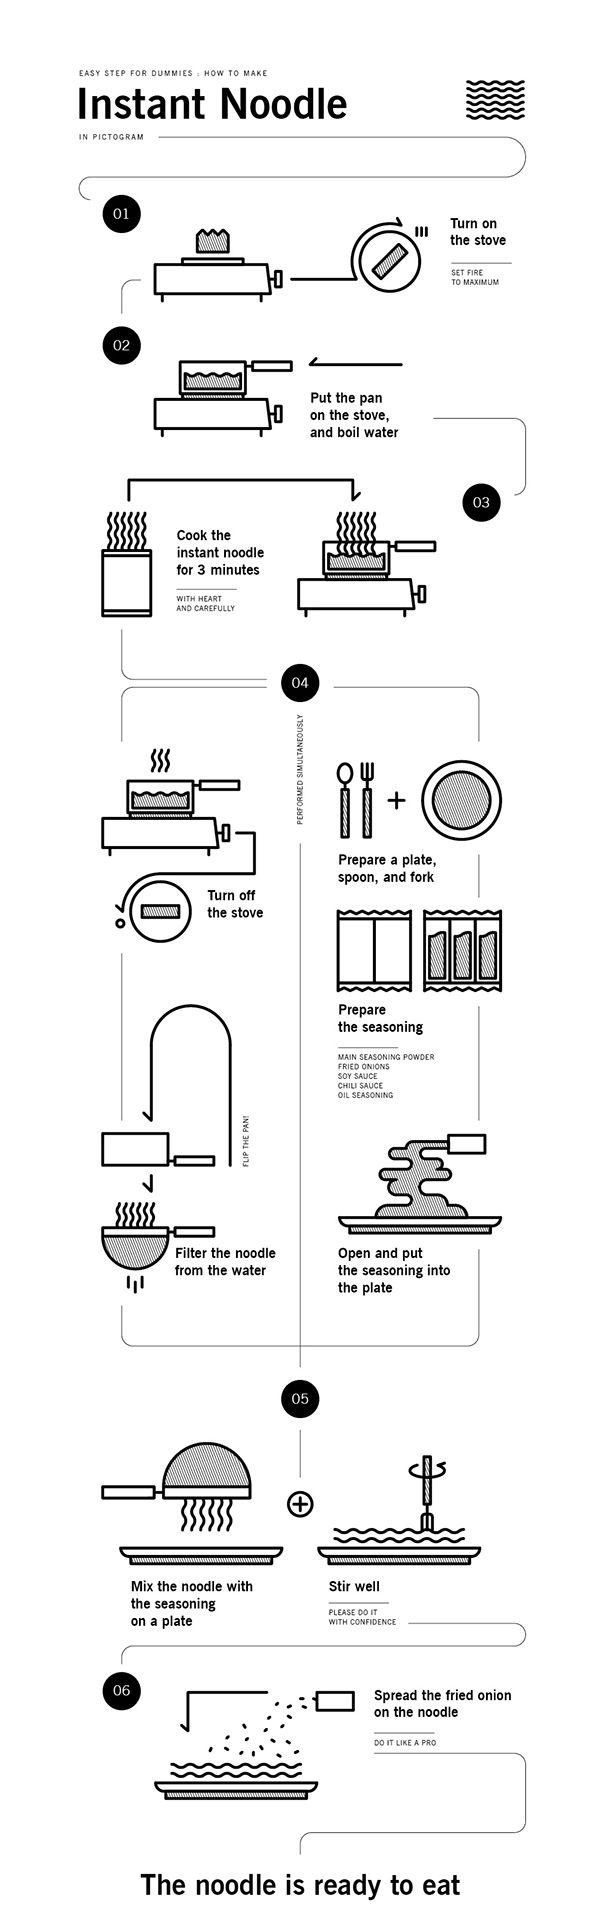 https://www.behance.net/gallery/21494931/Instant-Noodle-for-Dummies?isa0=1